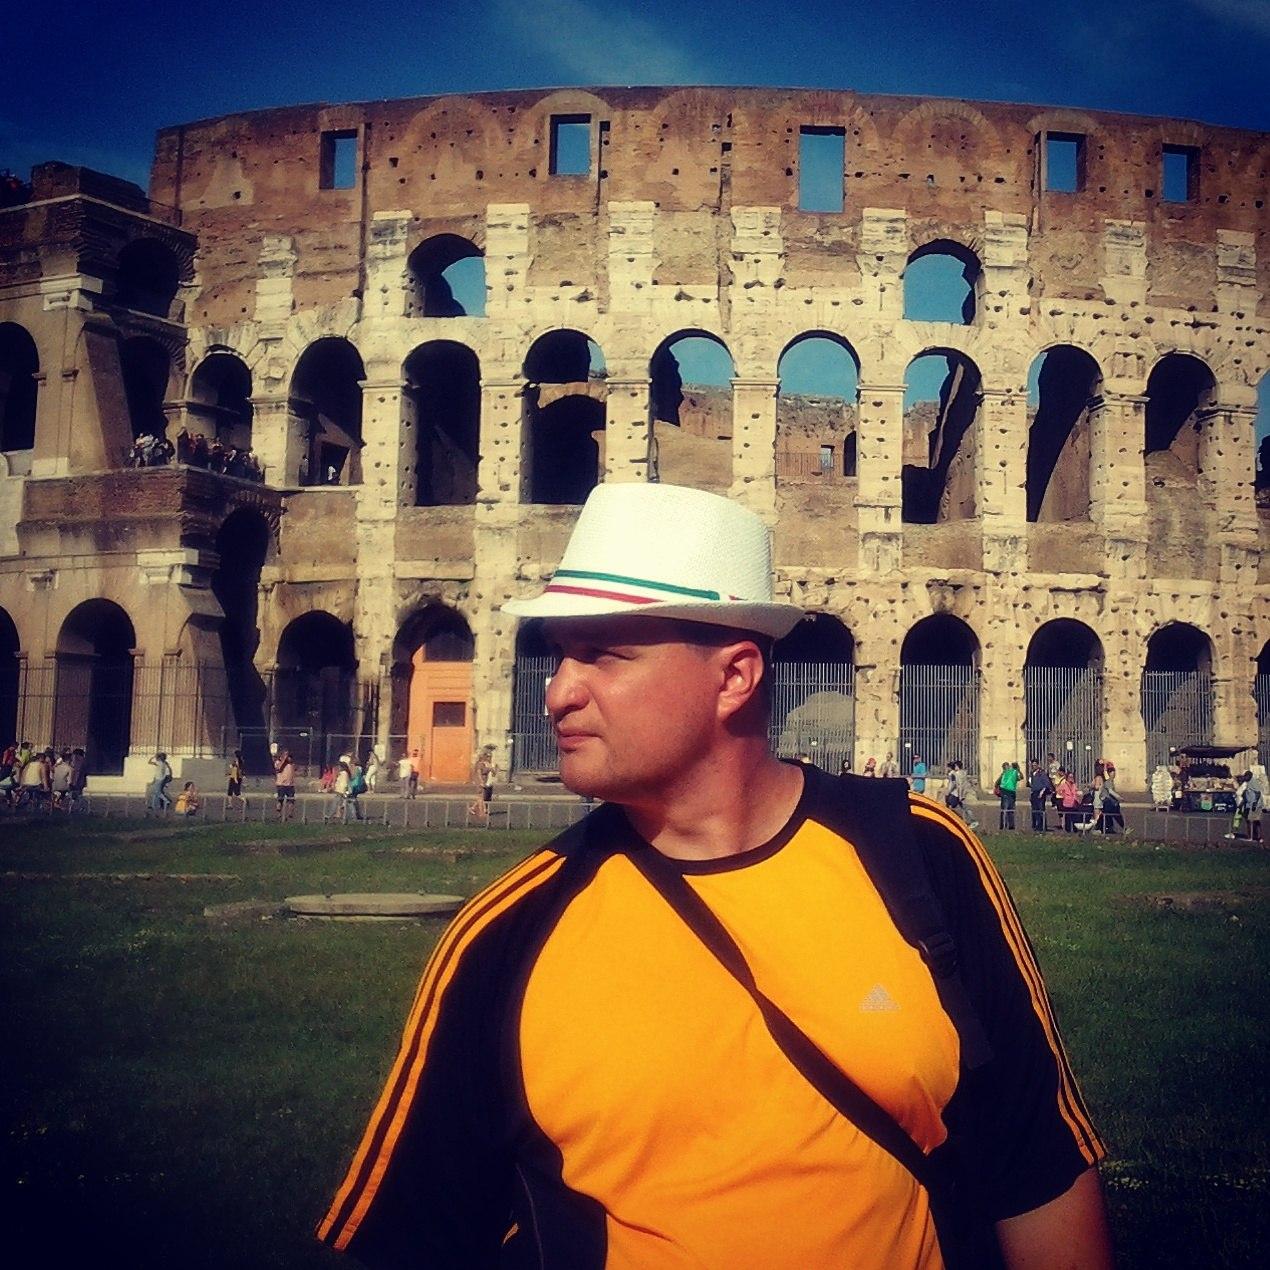 foFF4ik Roma Rome Рим Italia Italy Италия Італія Colosseo Колизей Колізей